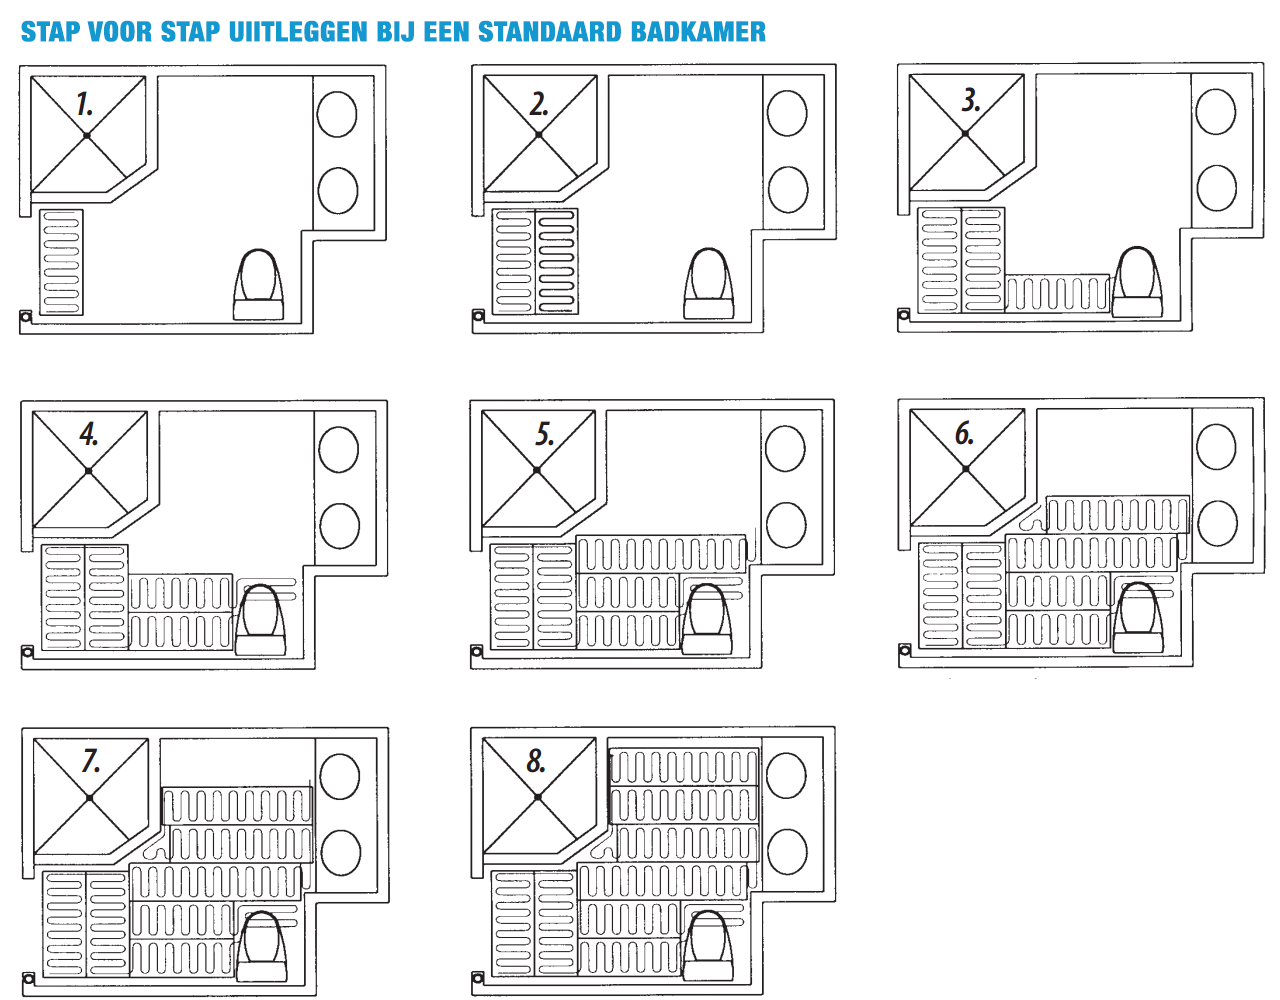 Beautiful Vloerverwarming Badkamer Retourleiding Ideas - Huis ...